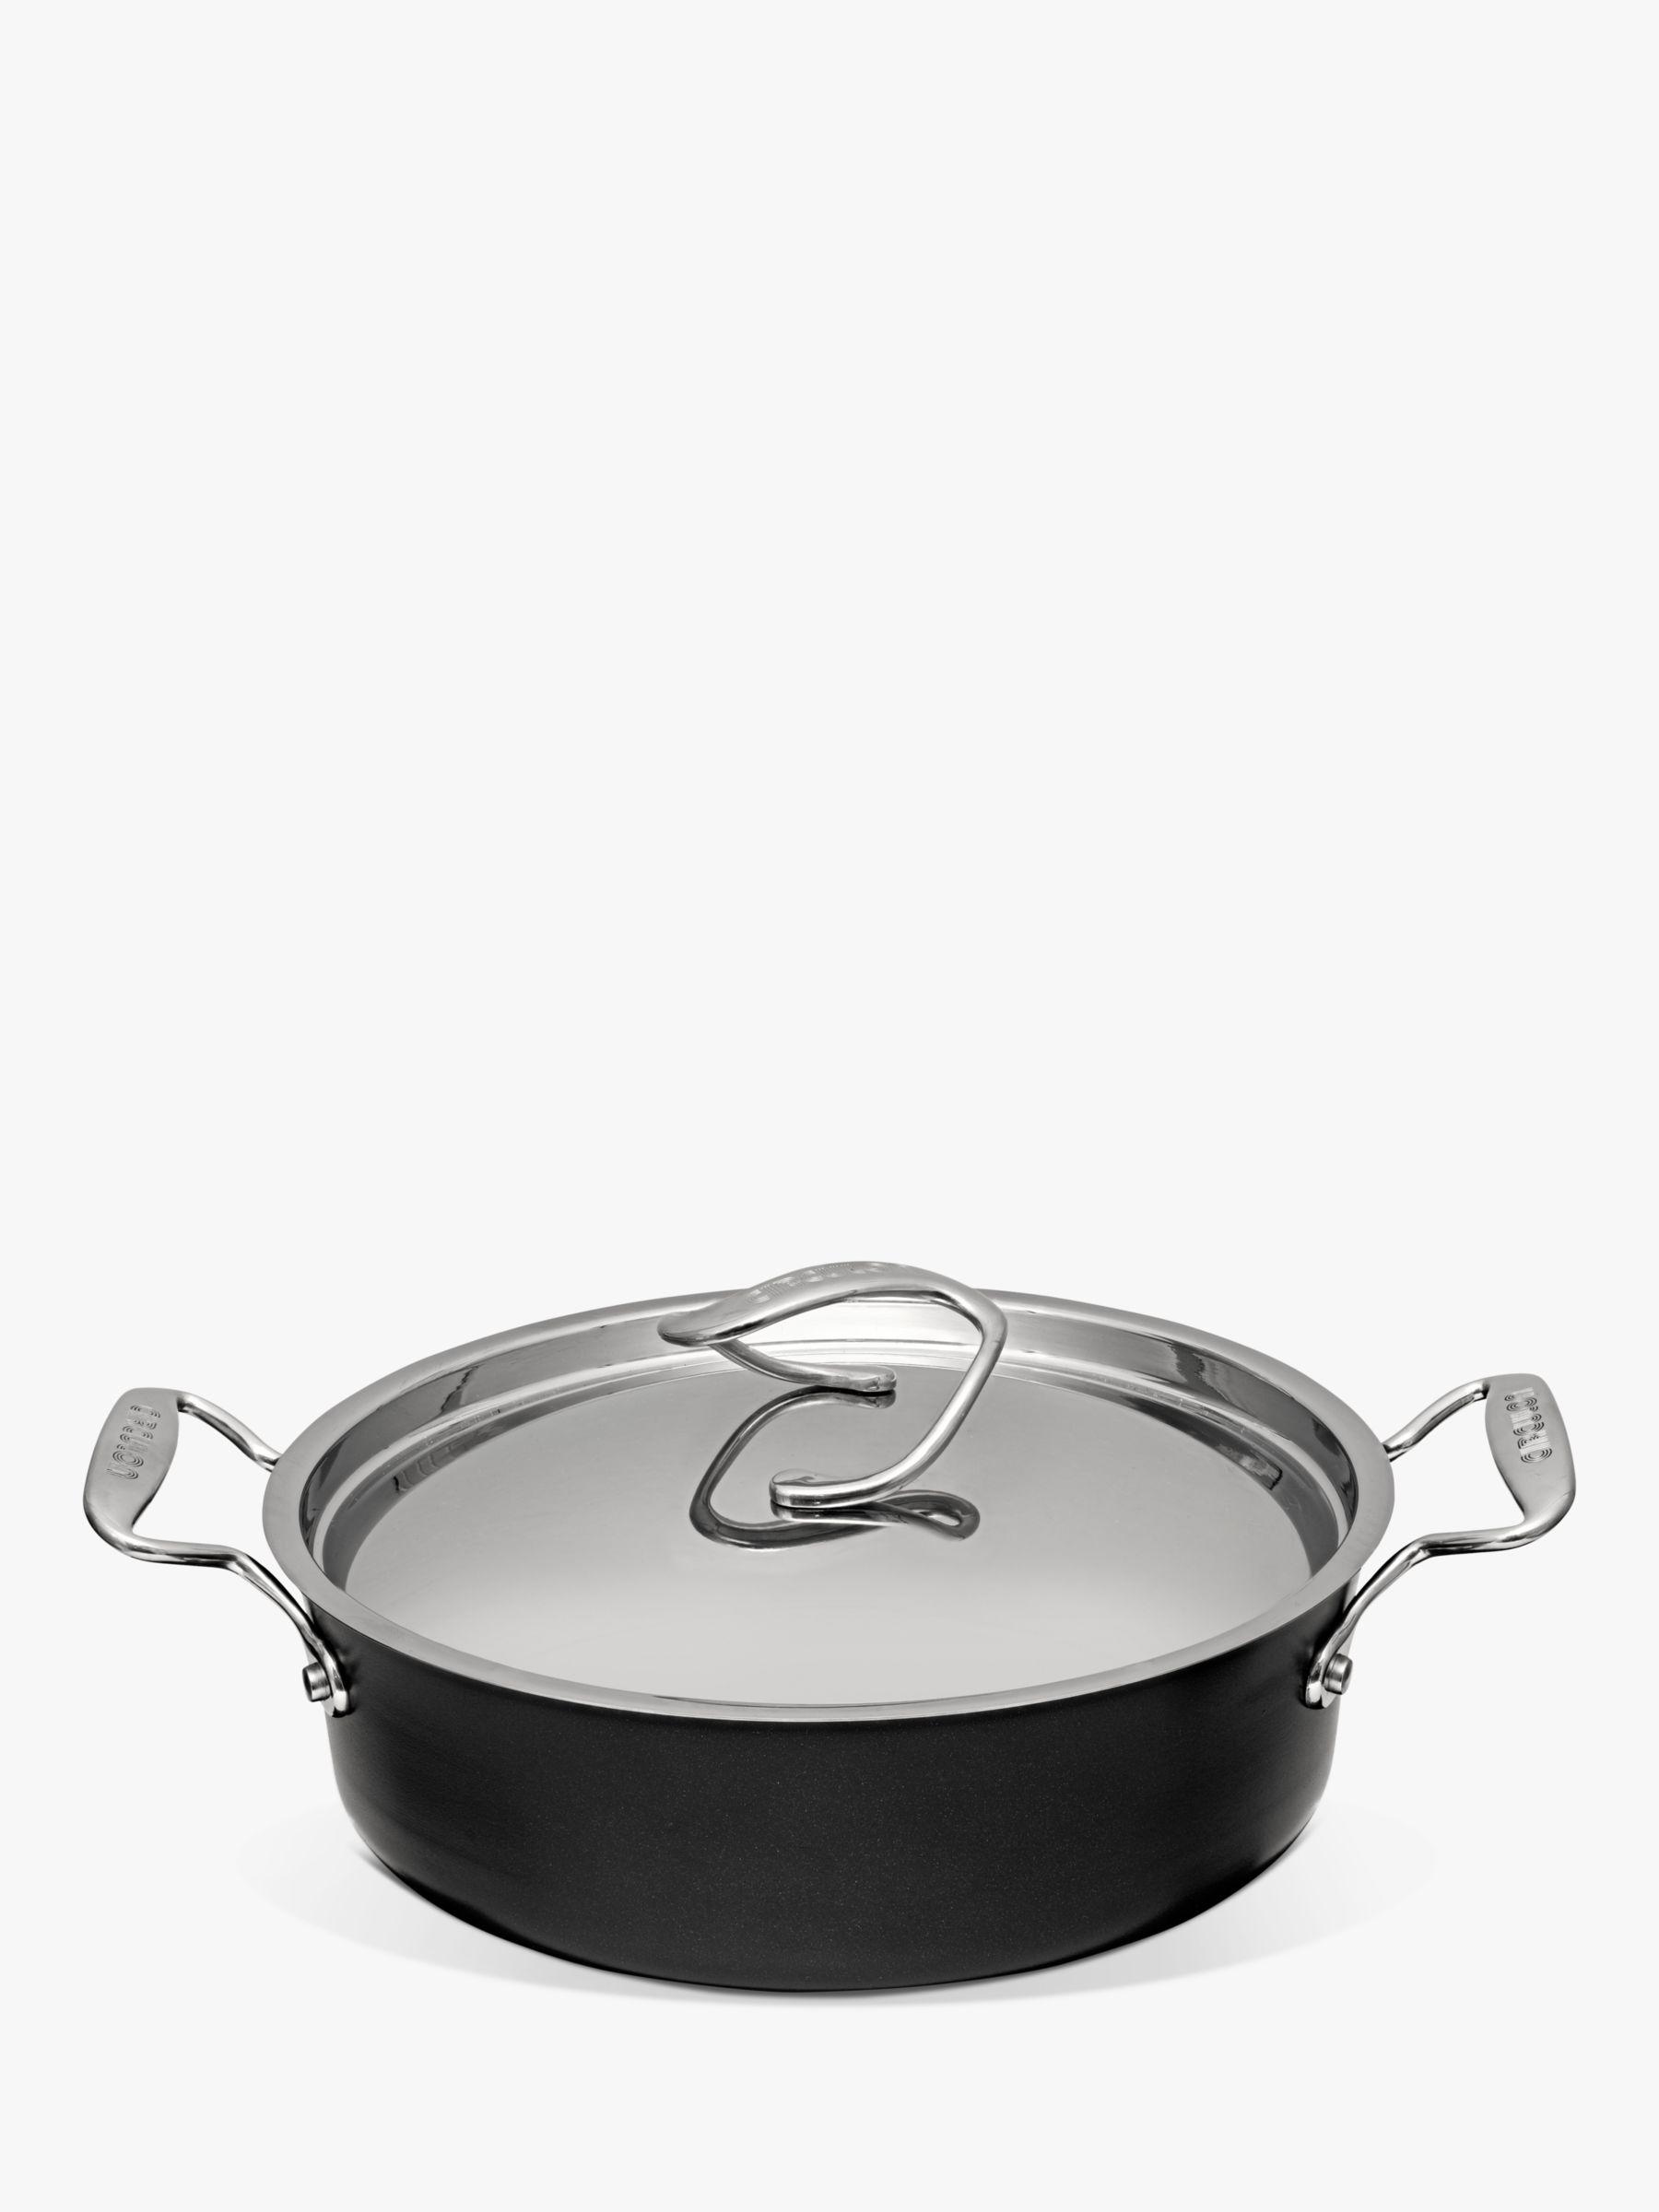 Circulon Circulon Style Hard-Anodised Aluminium Non-Stick Sauteuse Pan & Lid, Black